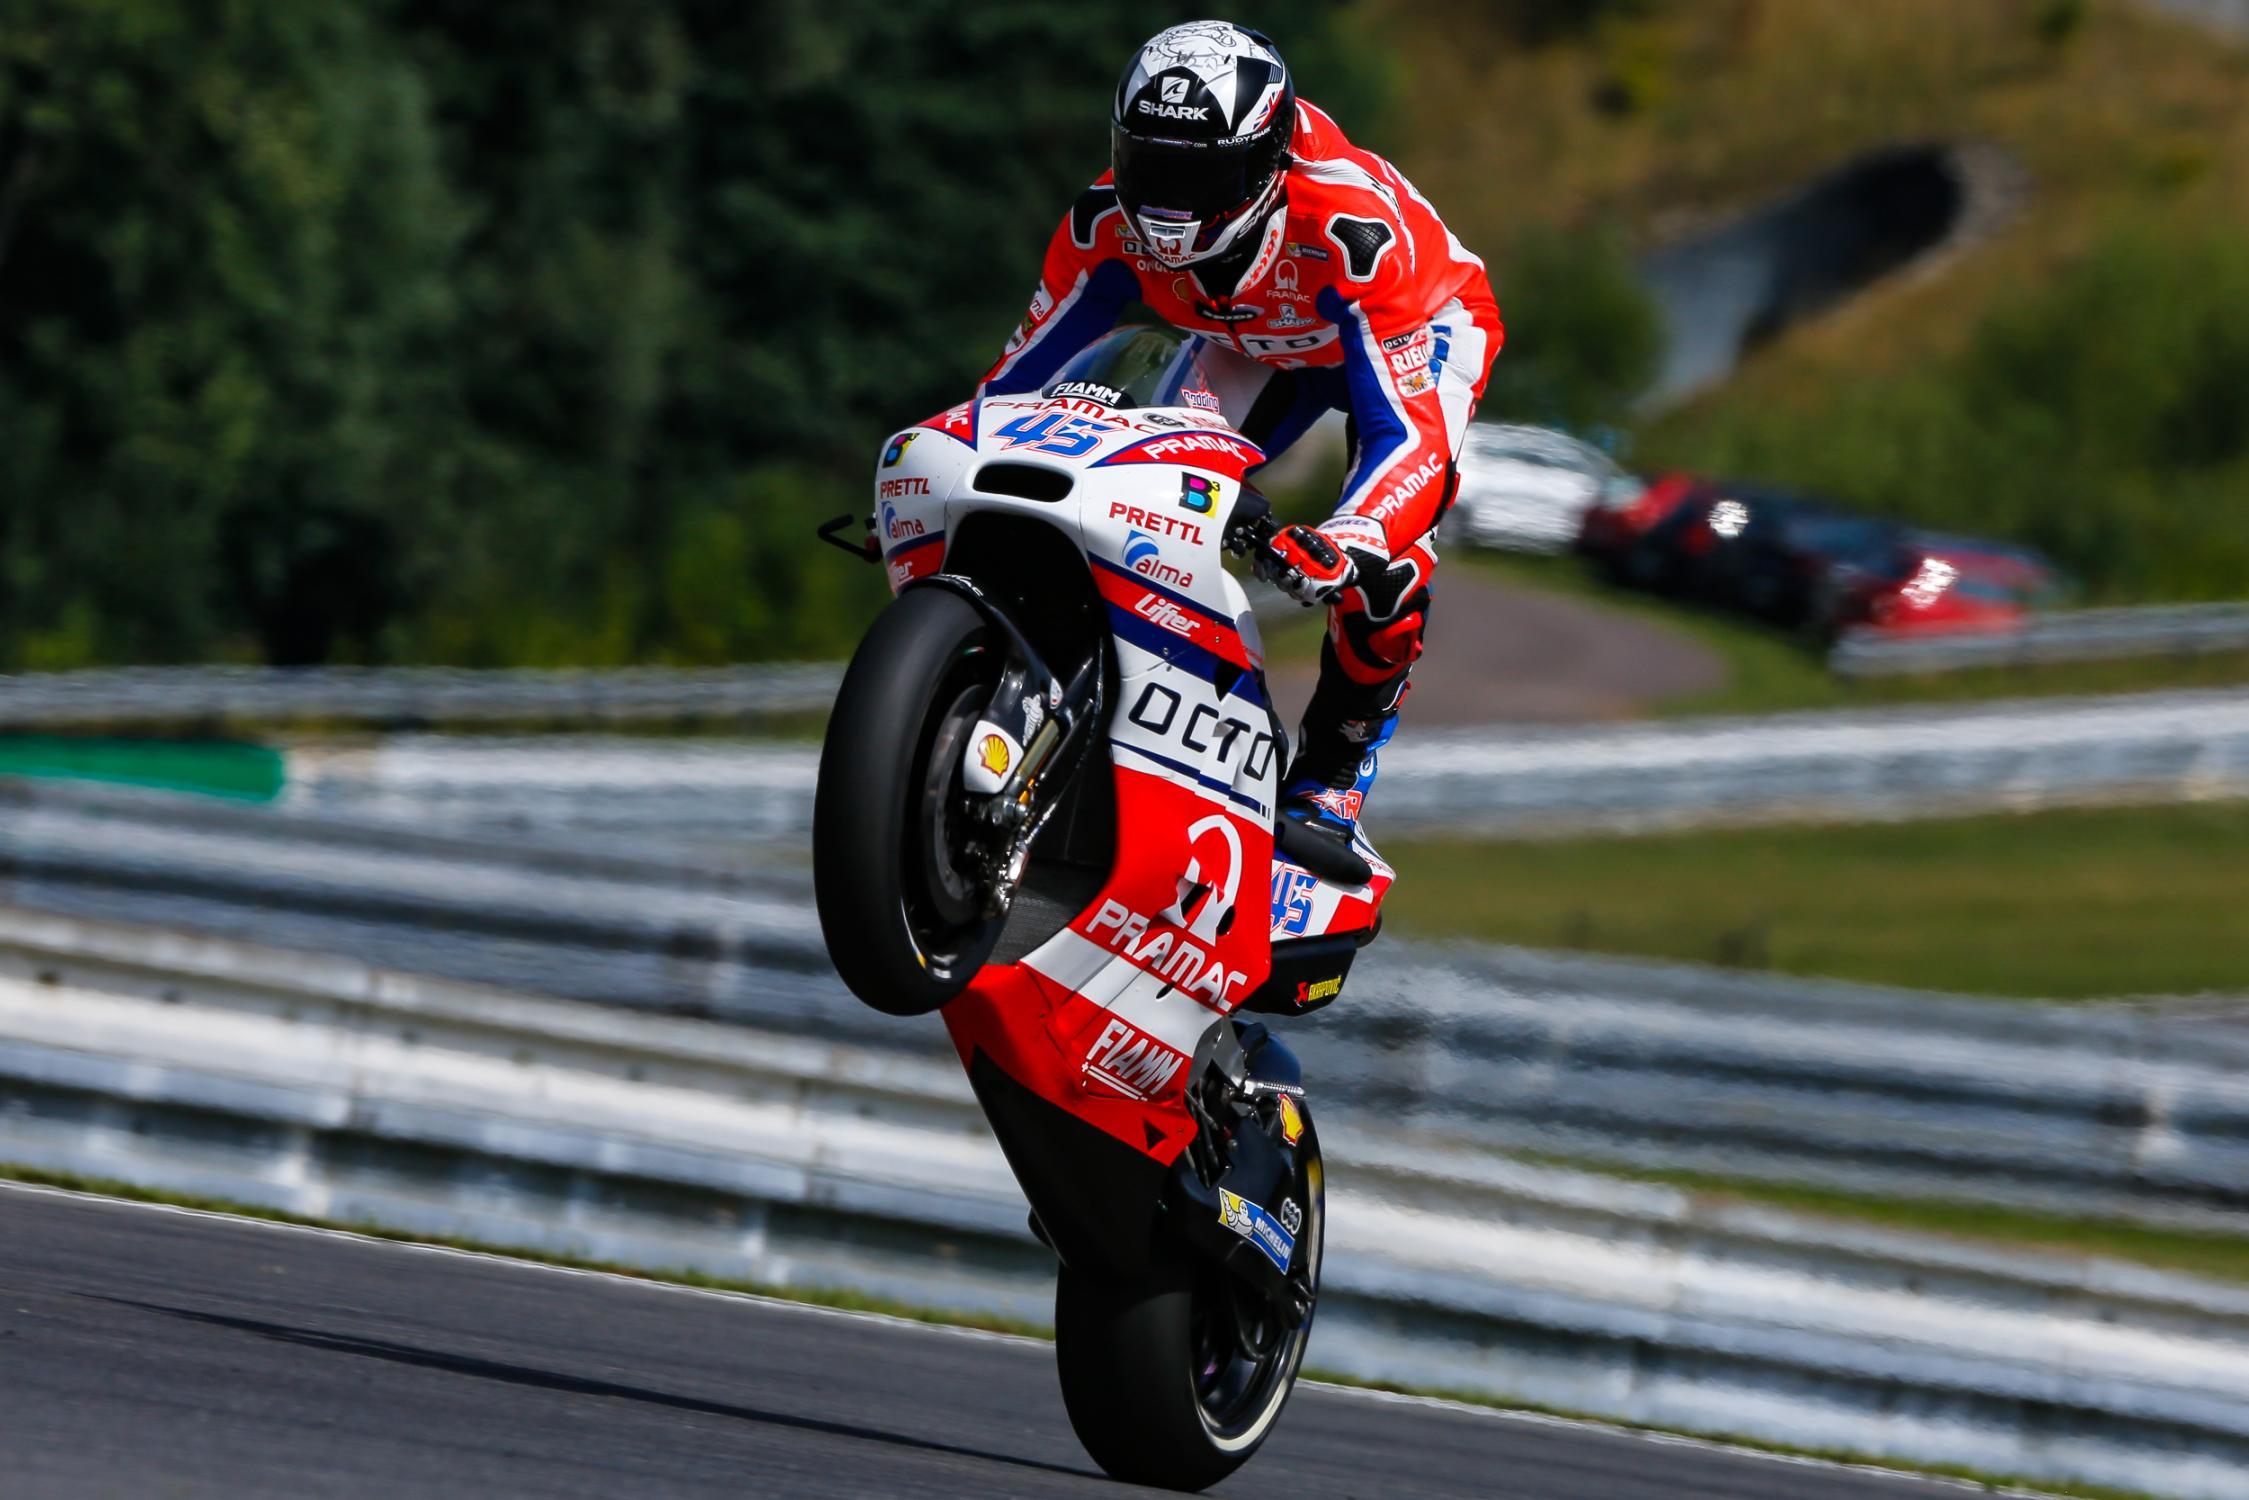 [GP] Brno 45-scott-redding-eng_gp_6550.gallery_full_top_fullscreen